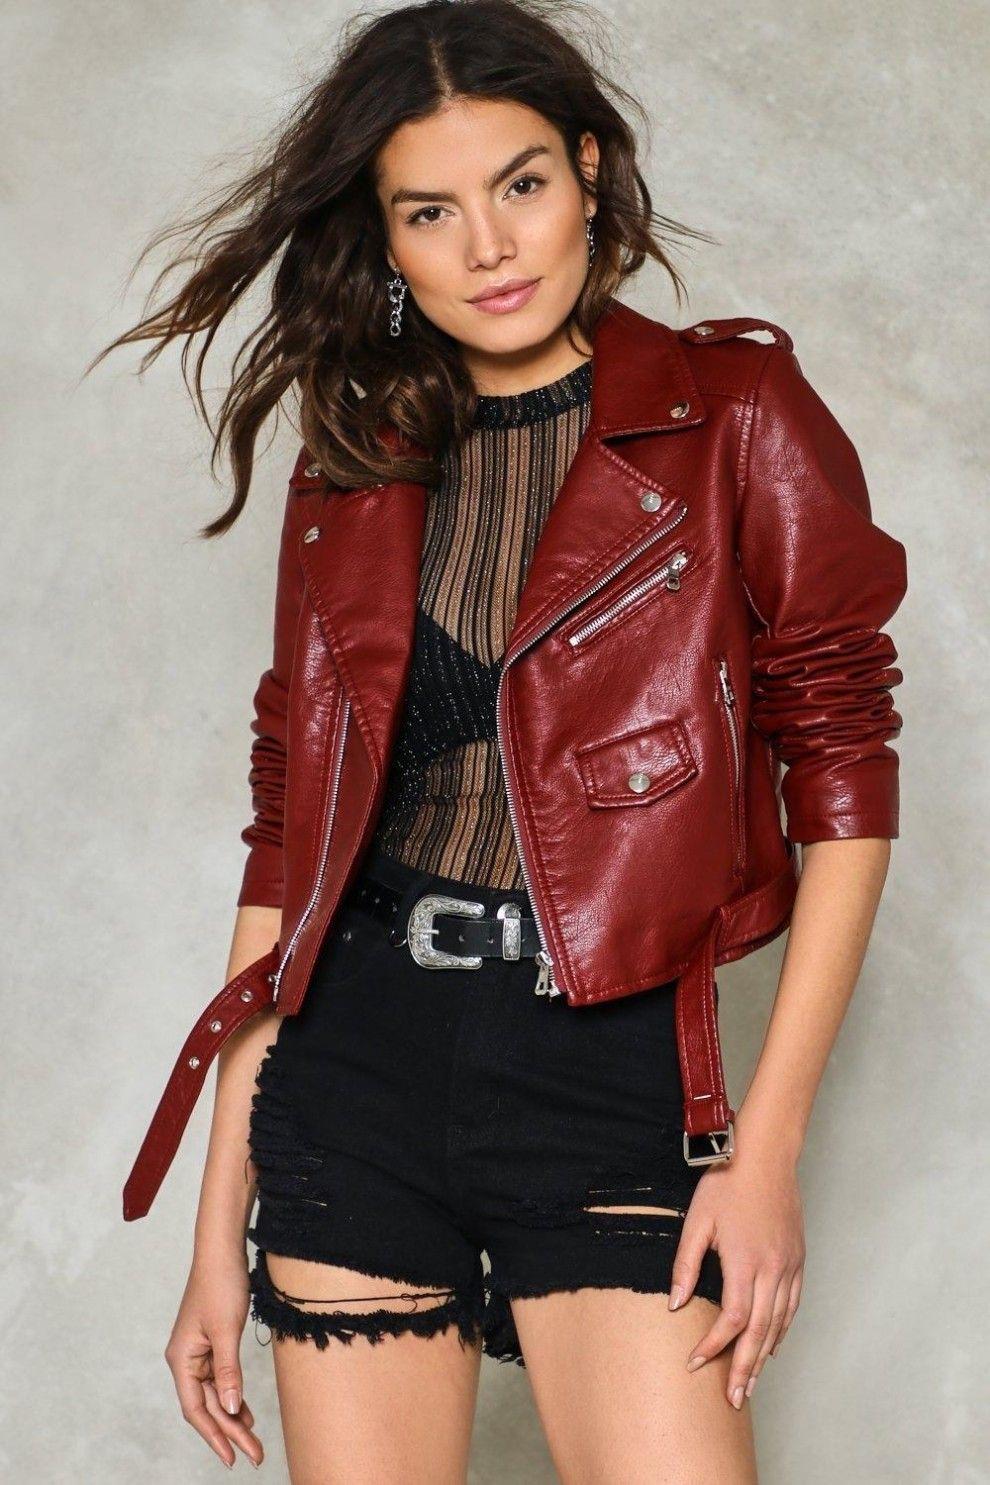 A vegan leather jacket for 40.50 (originally 90